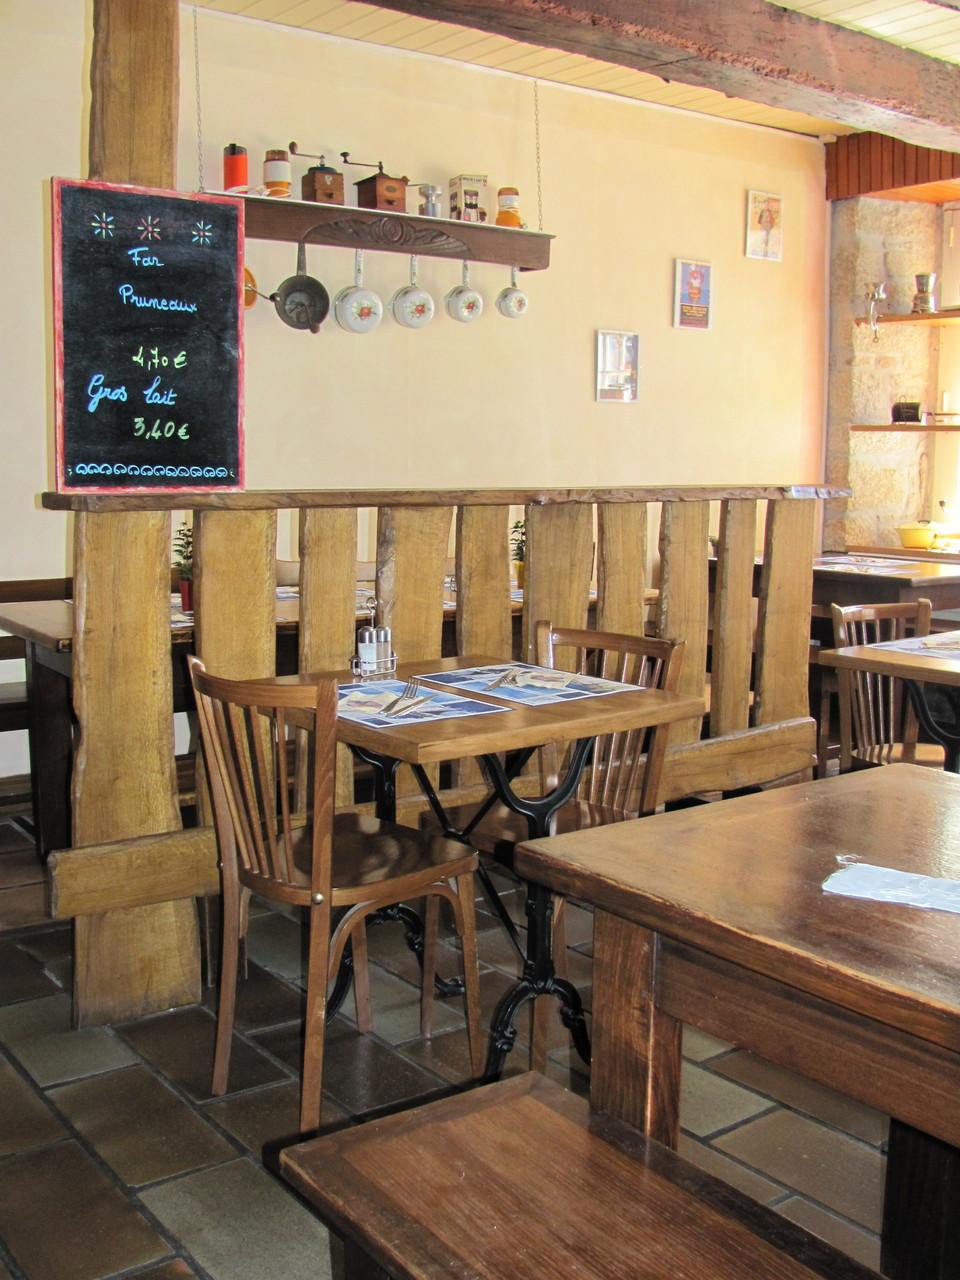 La salle de restaurant de la crêperie Bigoudène